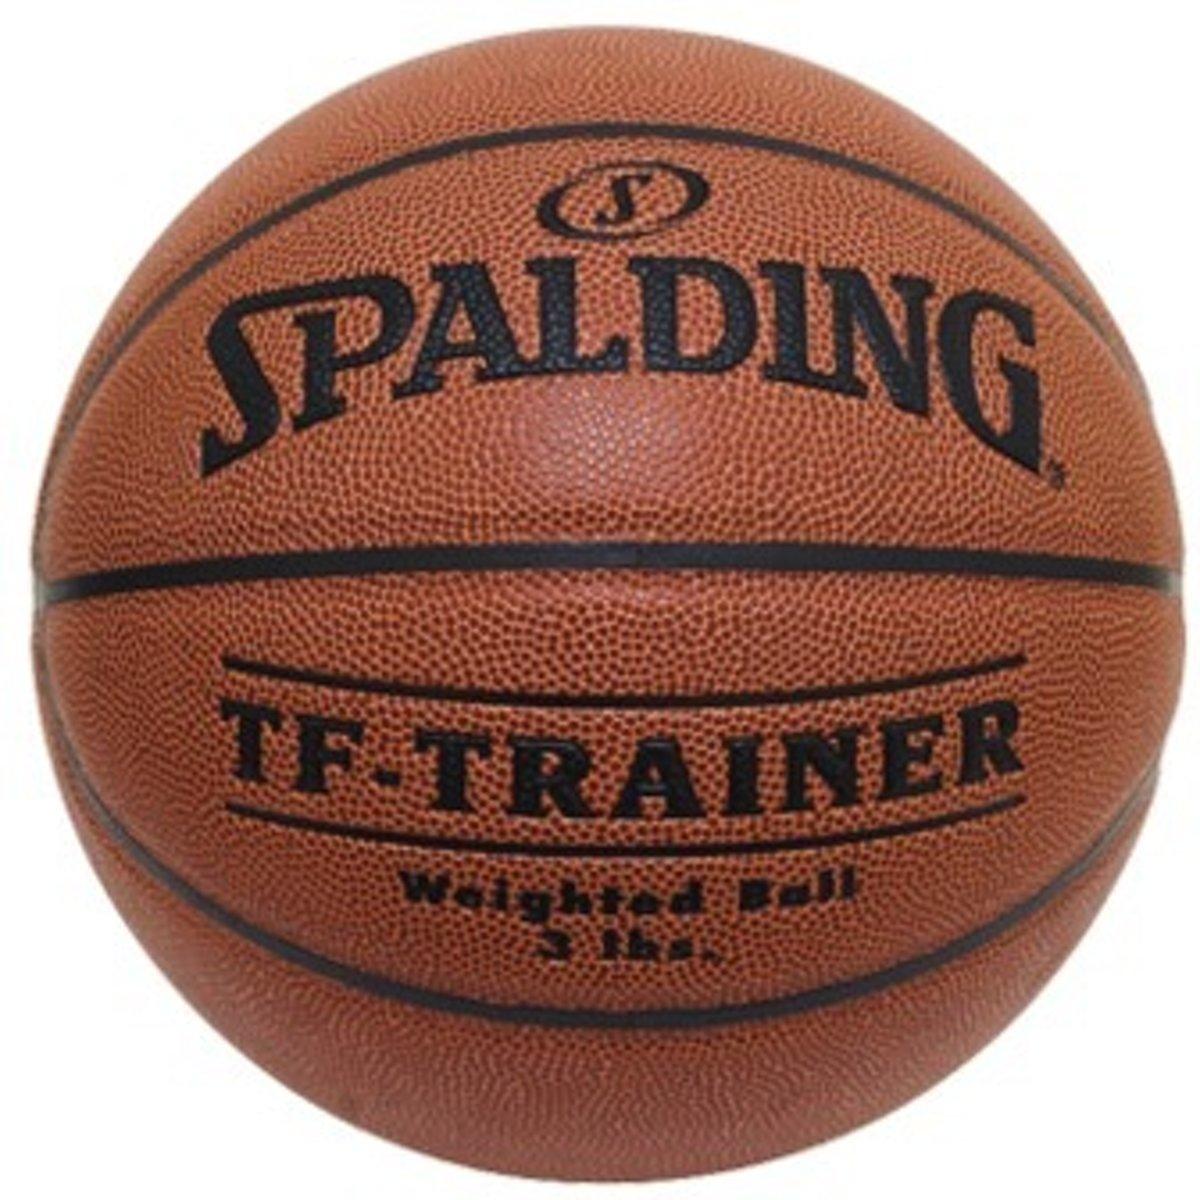 Spalding TF Trainer Heavy Basketbal kopen